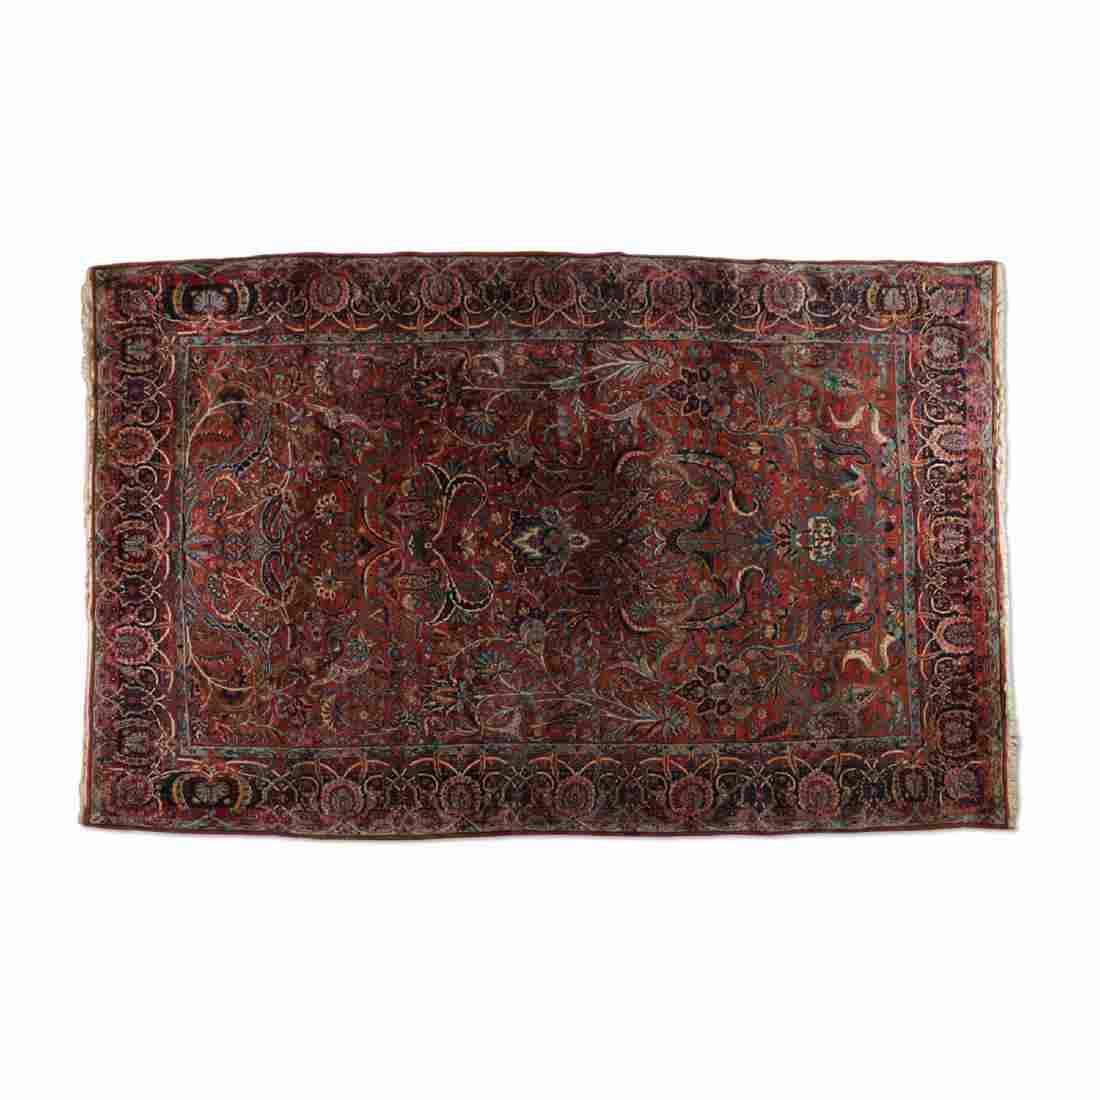 Handmade Persian Yazd Rug, 1920s